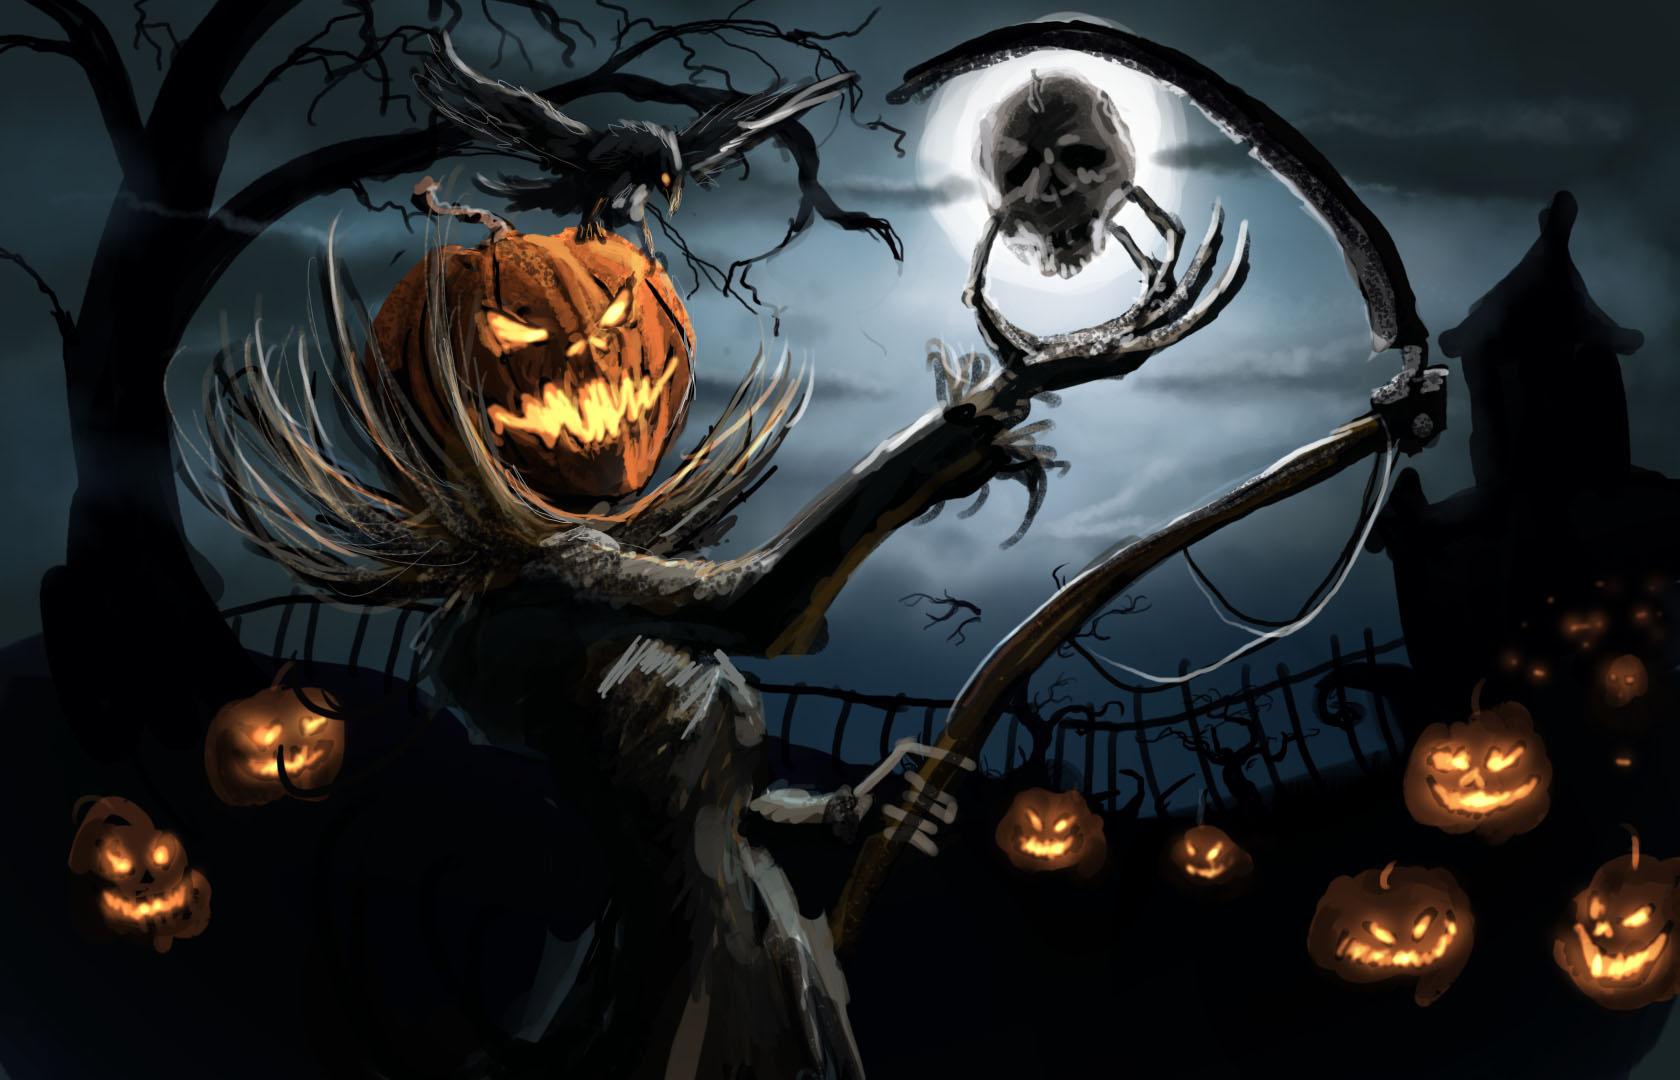 Halloween 2013 Backgrounds Wallpapers 1680x1080